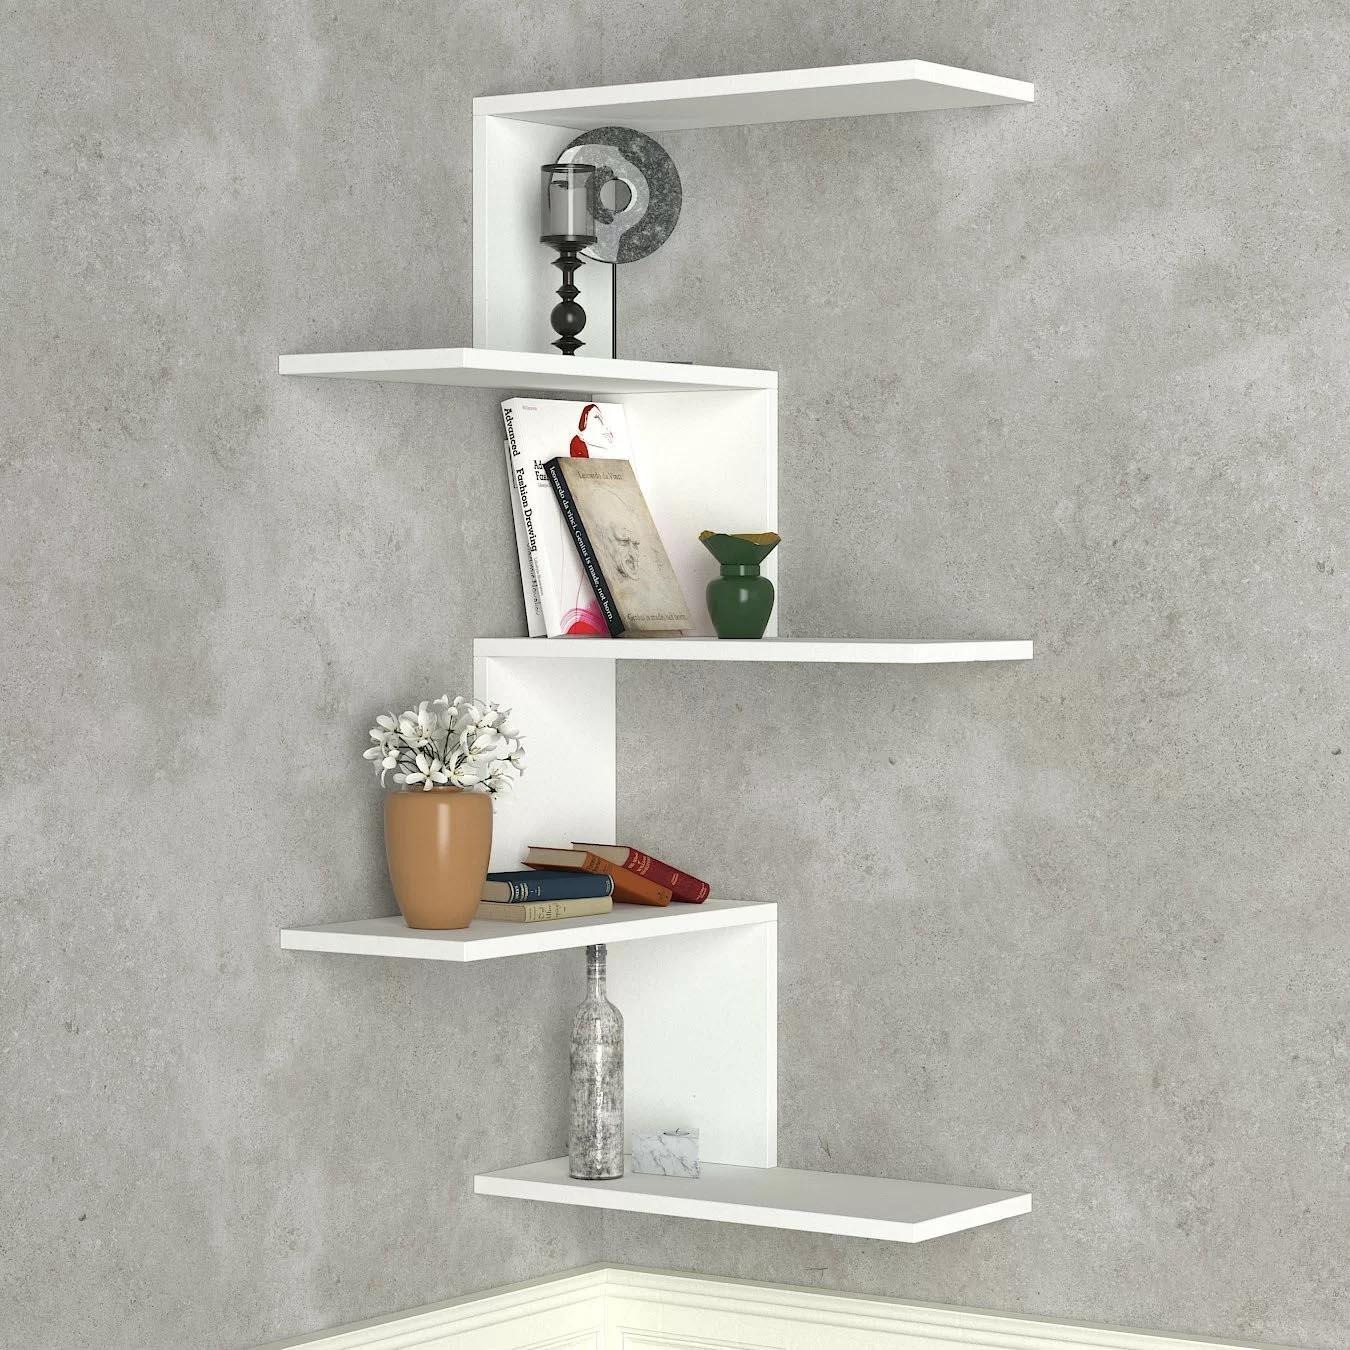 Corner Shelf Ideas - A modern white corner shelf with multiple levels.